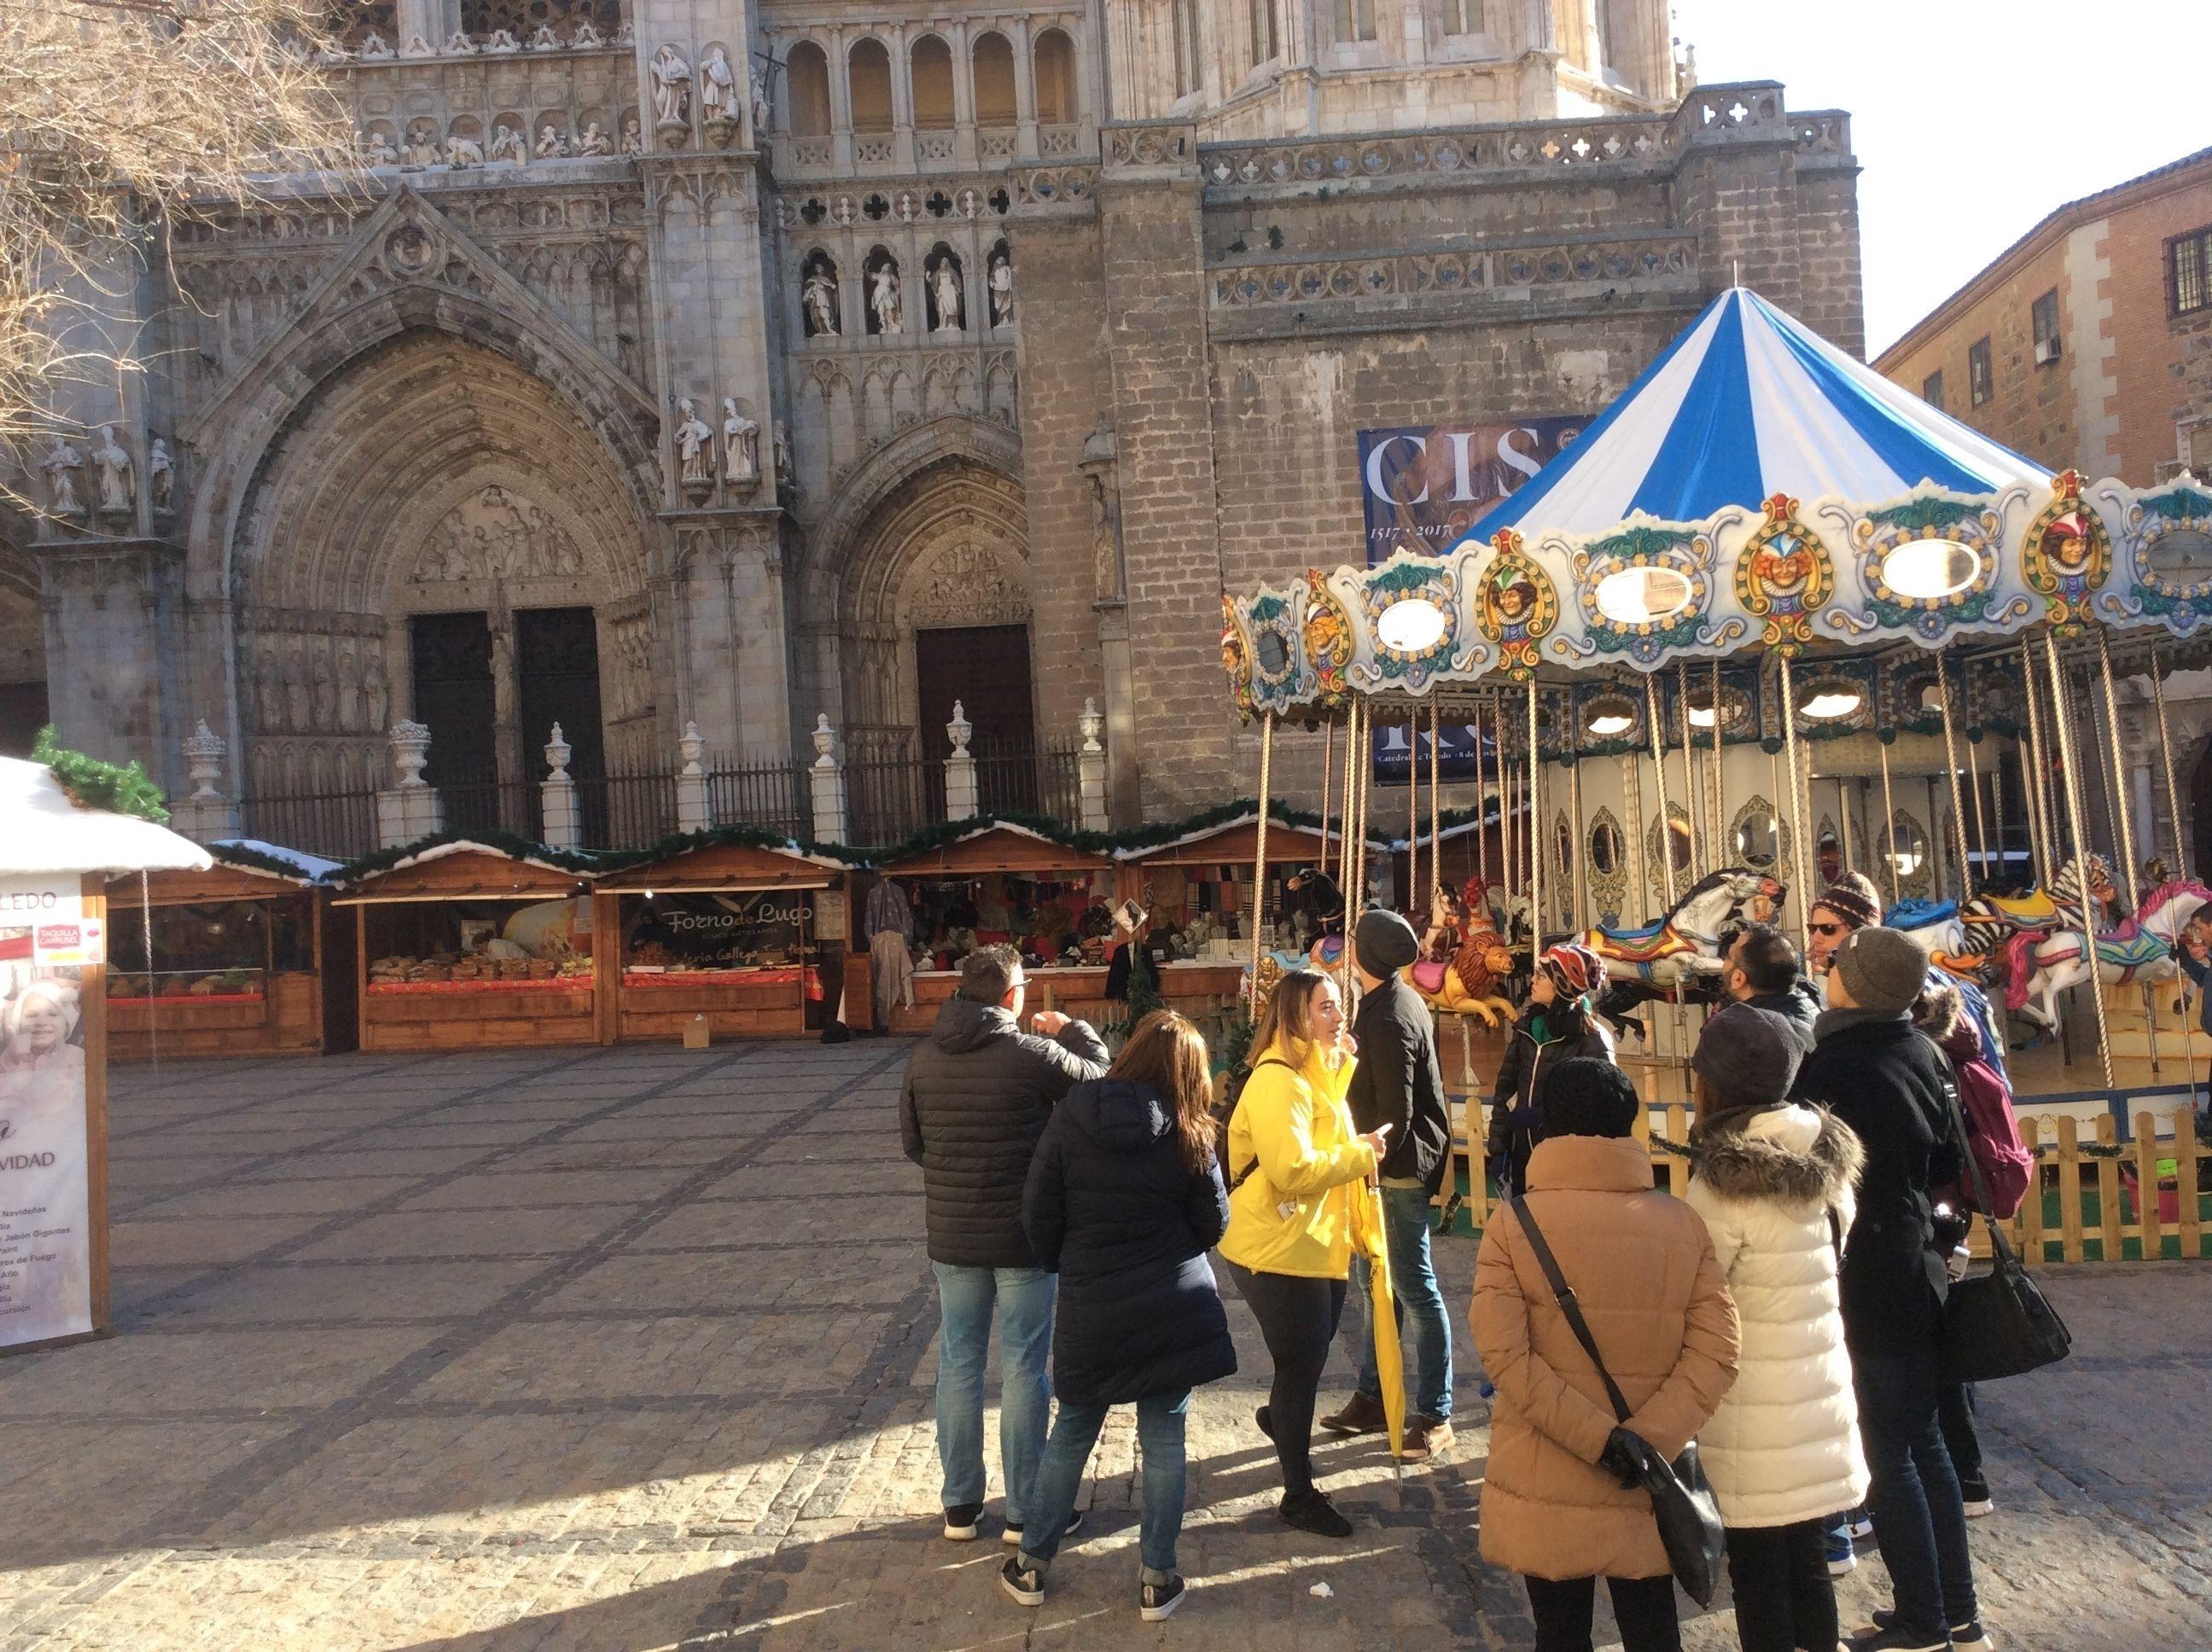 Segovia & Toledo with Fast Track Entry to The Alcazar